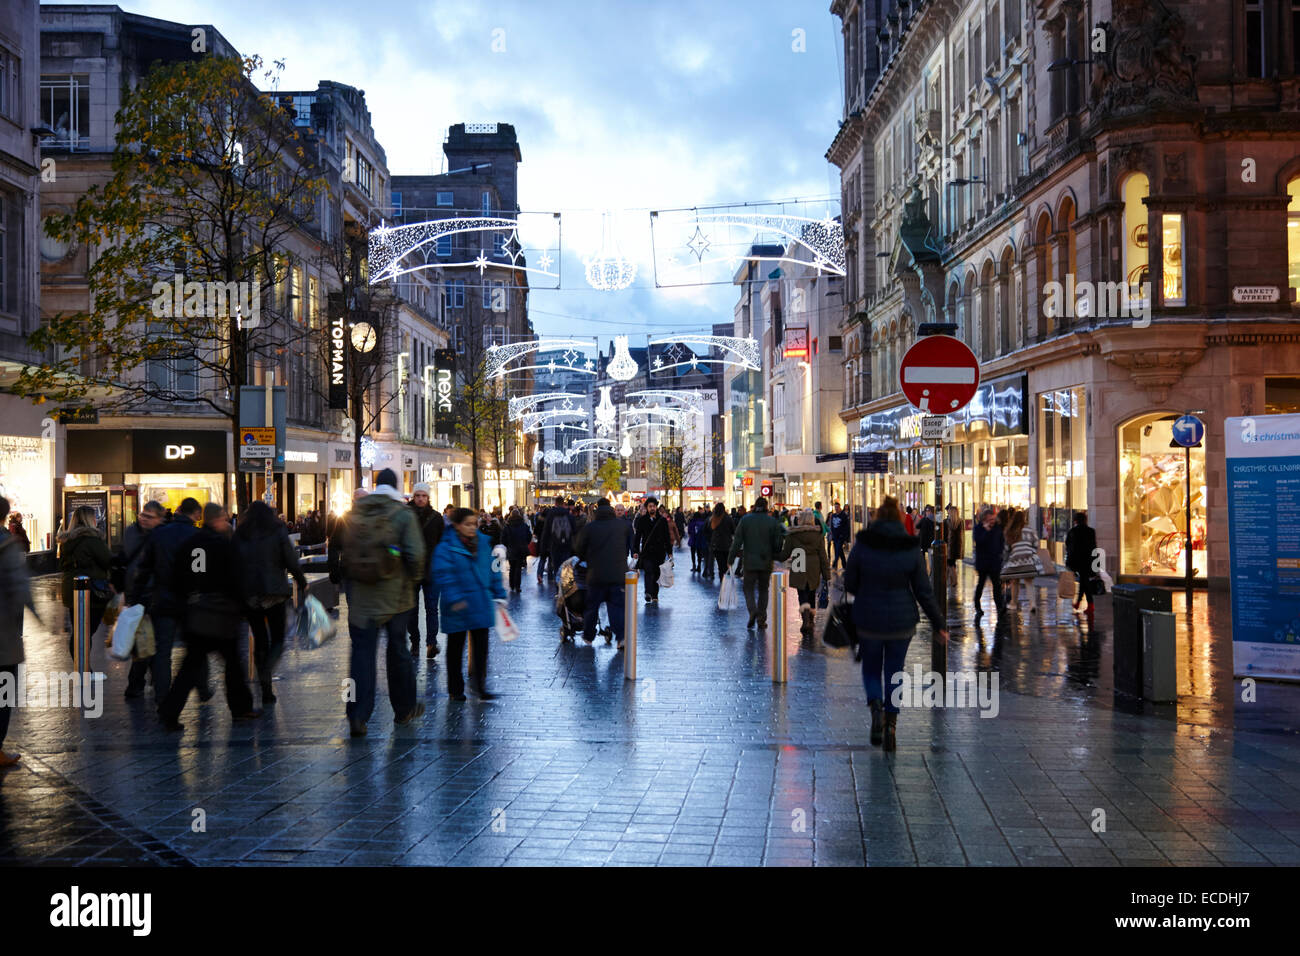 Liverpool city centre church street christmas shopping area UK - Stock Image